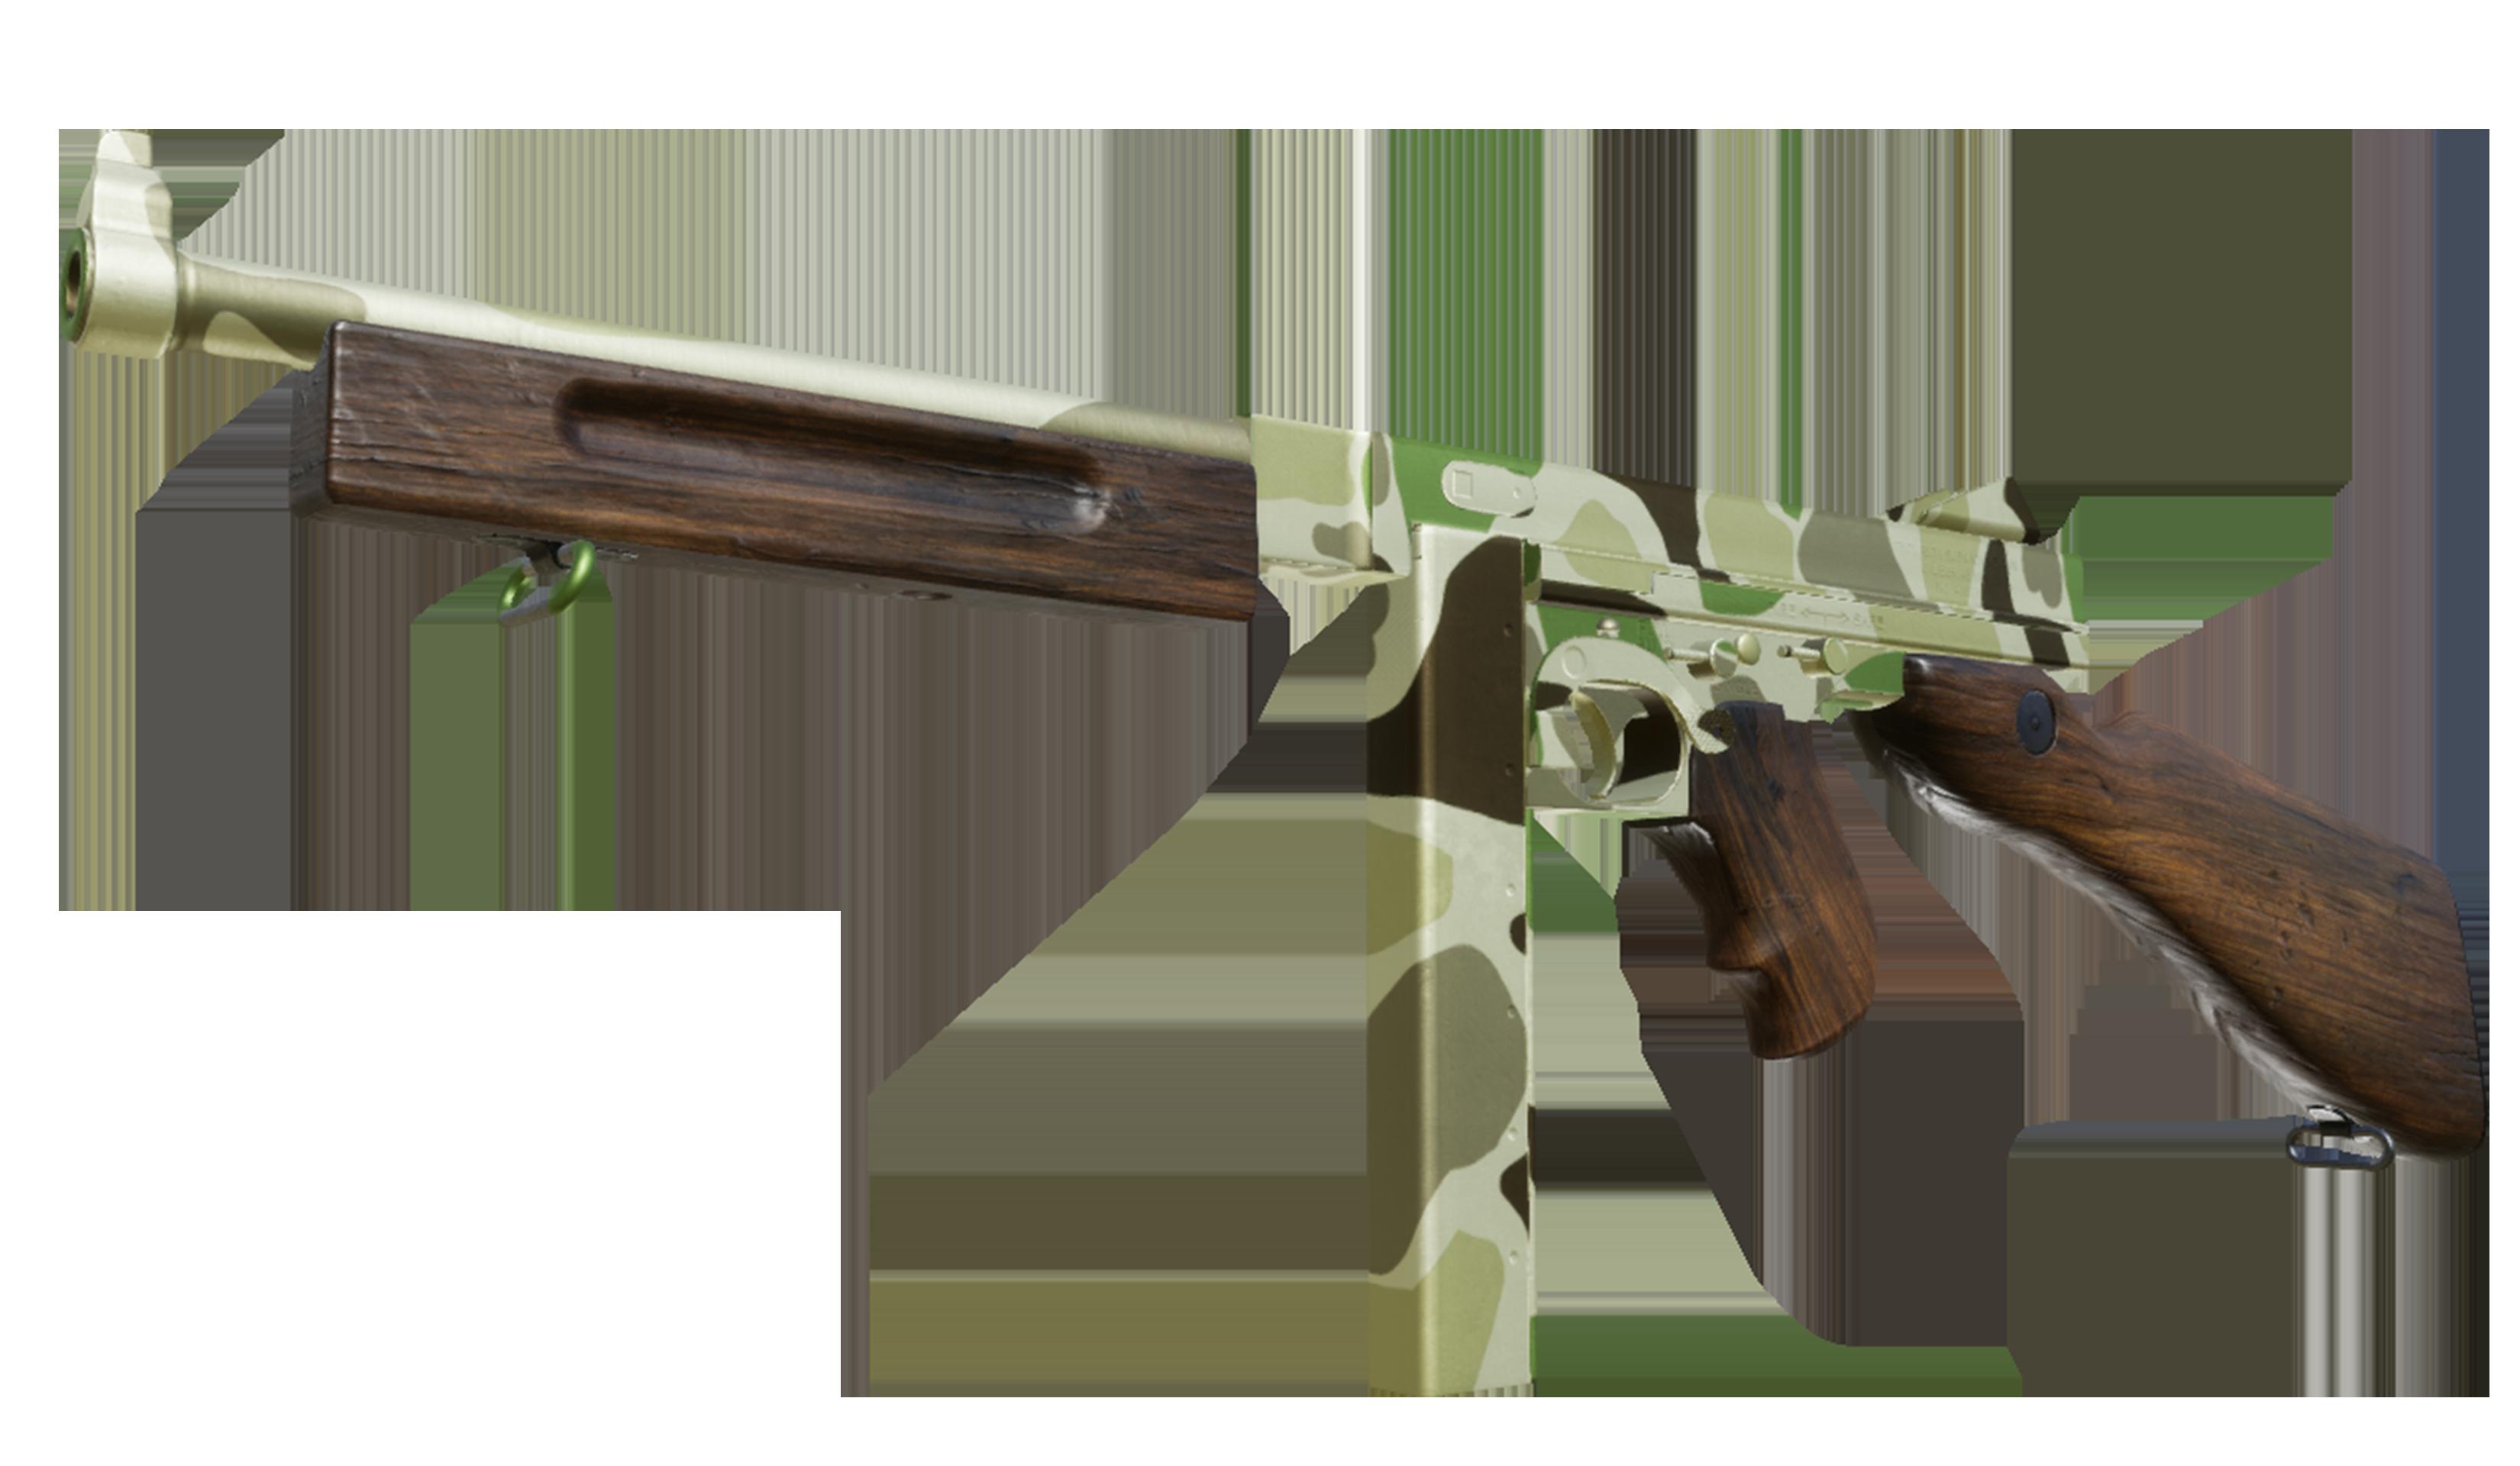 M1 Garand | Pacific Sky